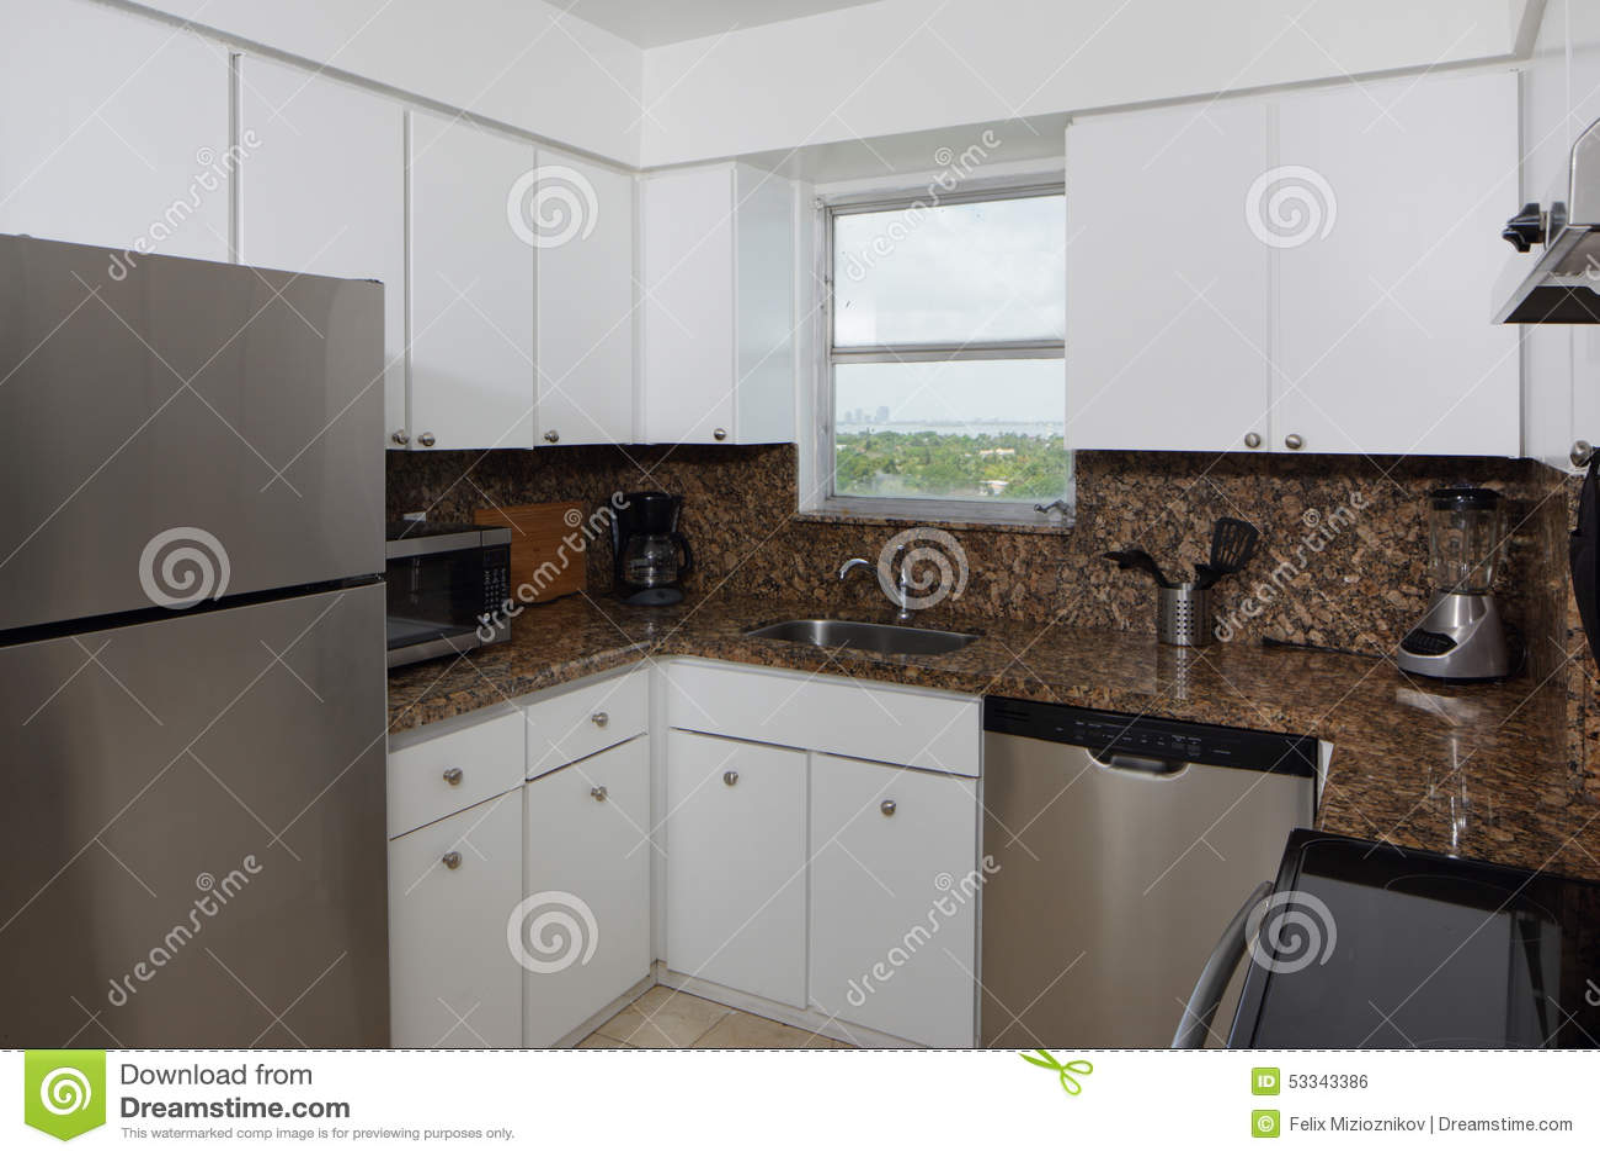 Slaapkamer minimalistische - Kleine keukenkap ...